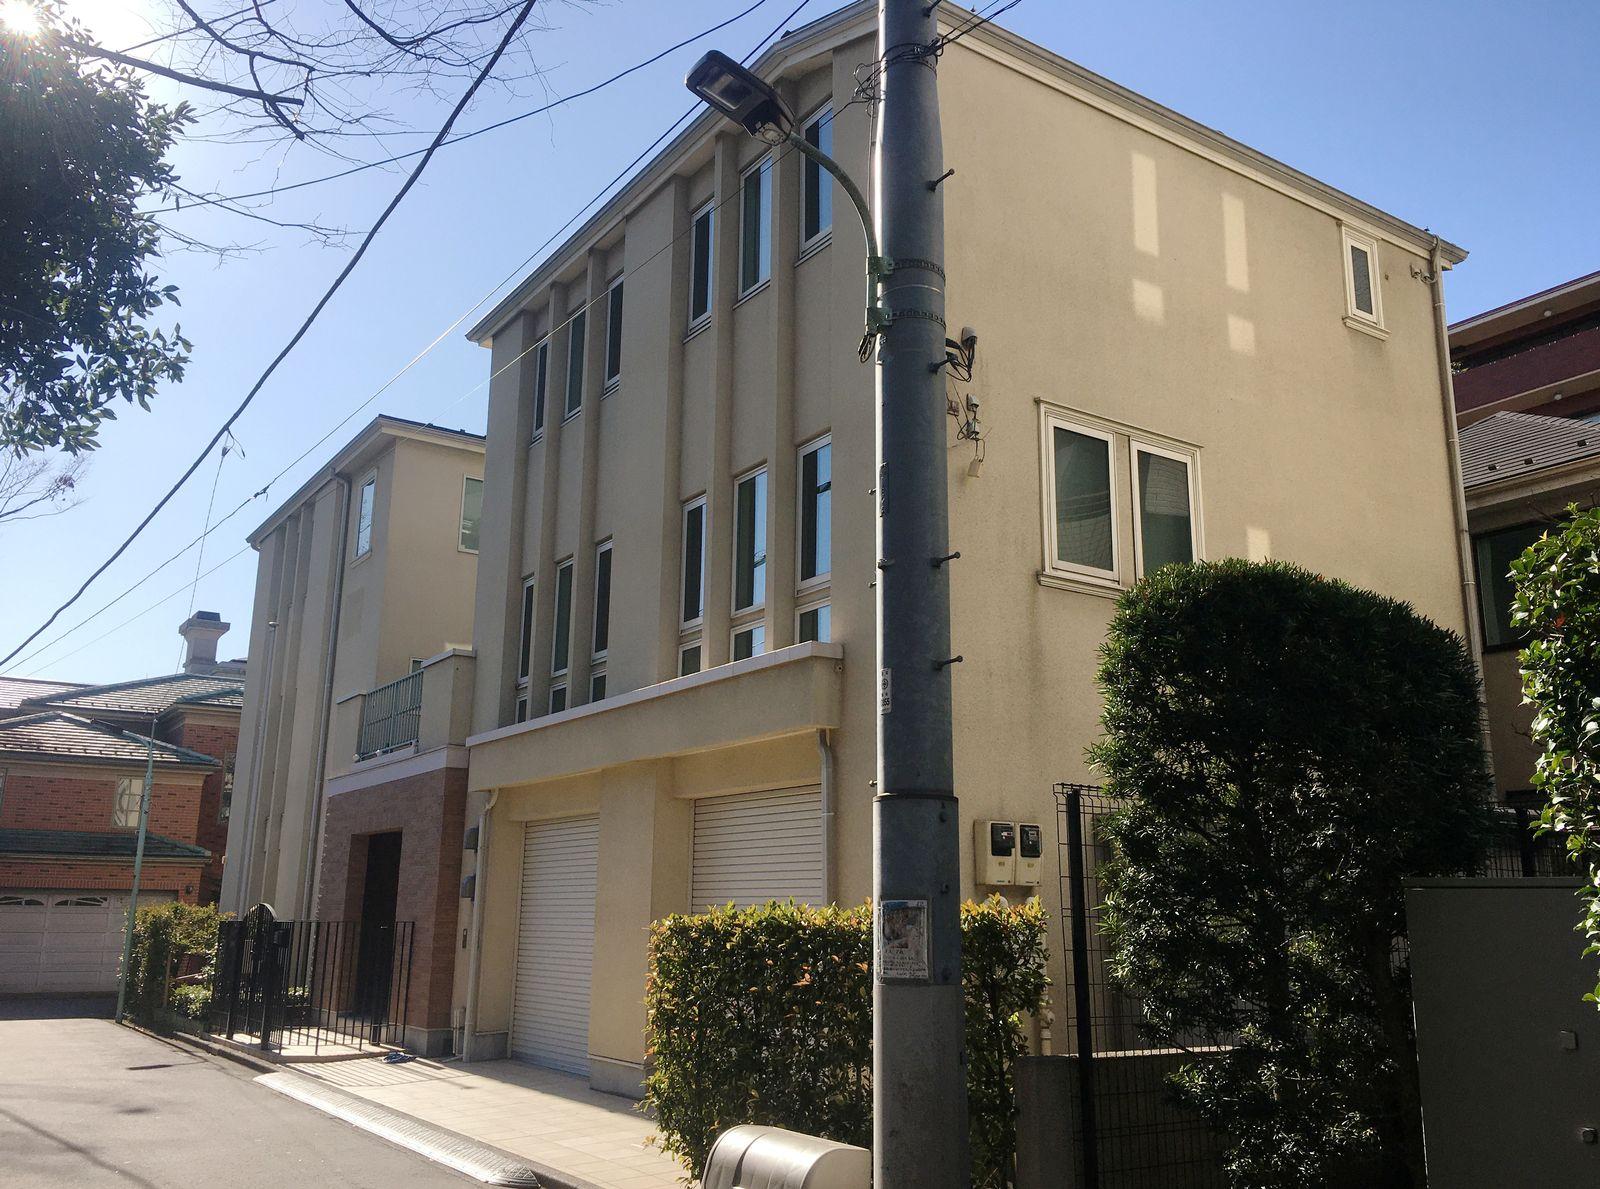 RENAULT-NISSAN/GHOSN-HOUSE